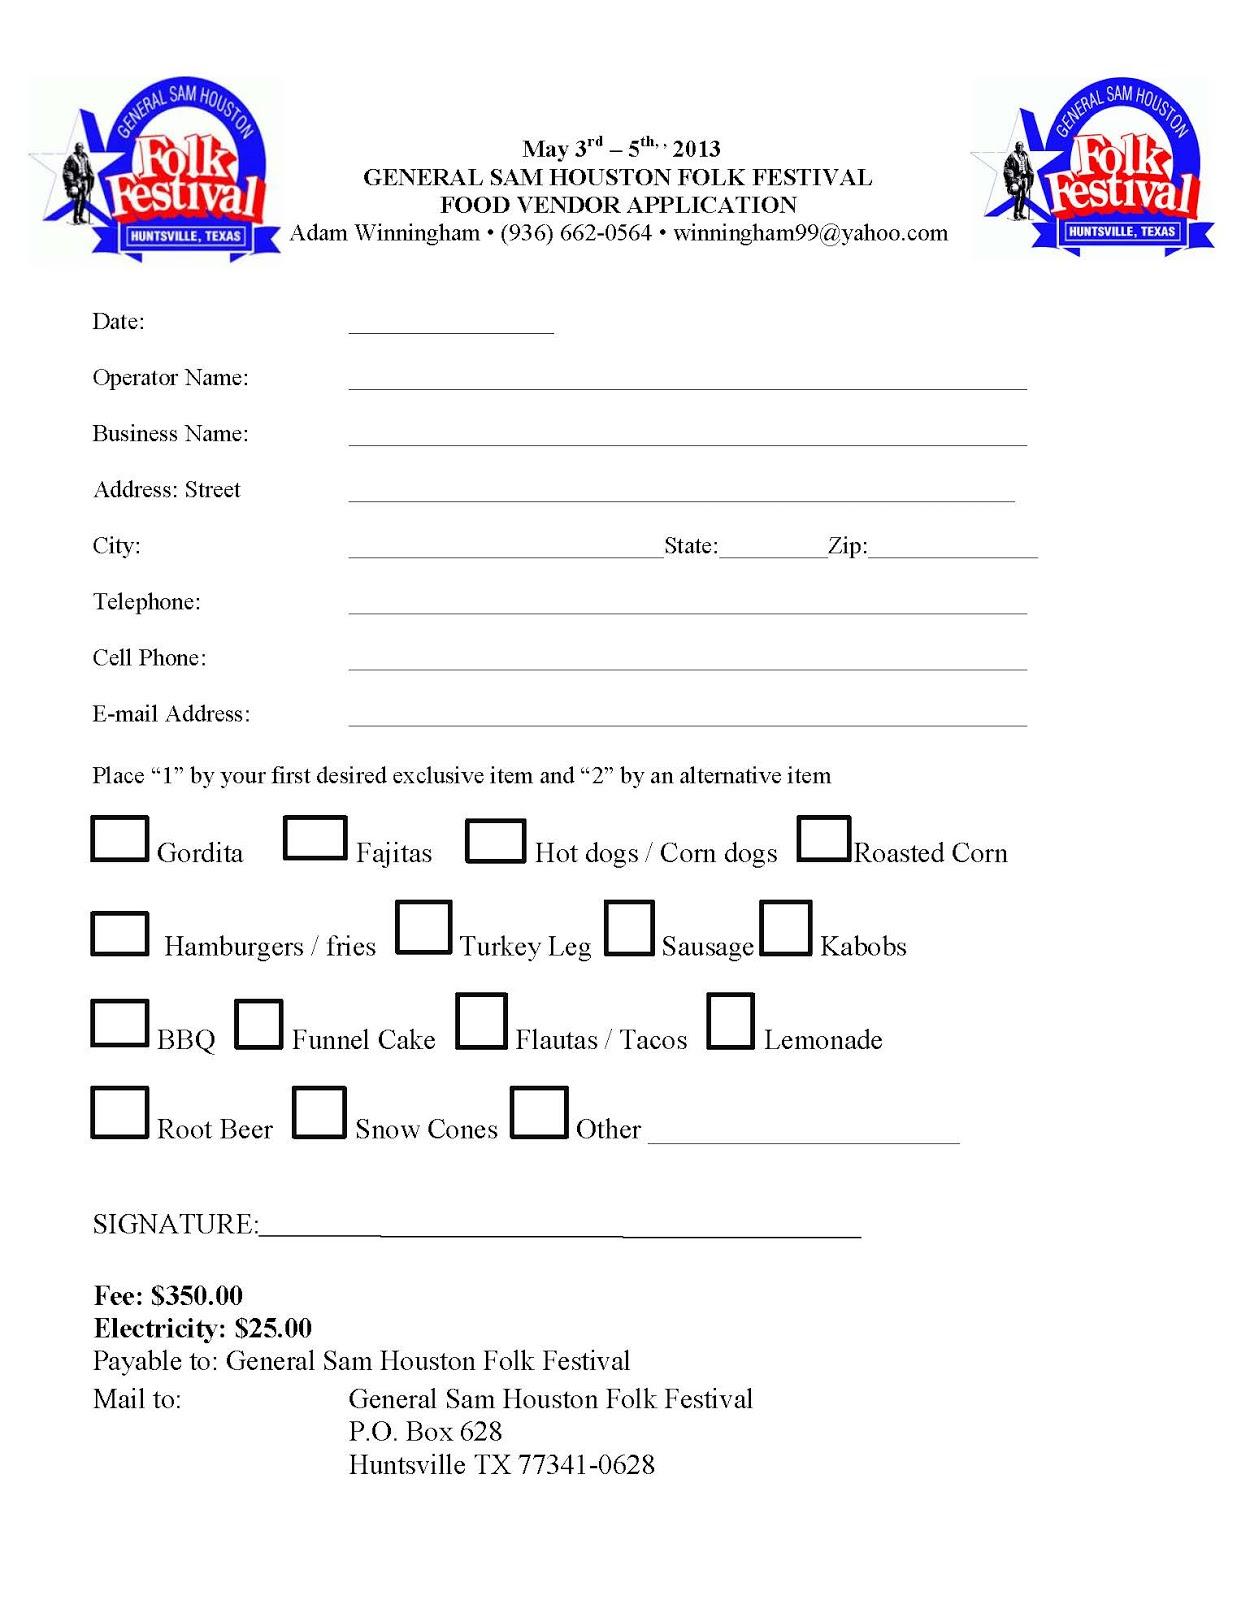 General Sam Houston Folk Festival: Food Vendor Application